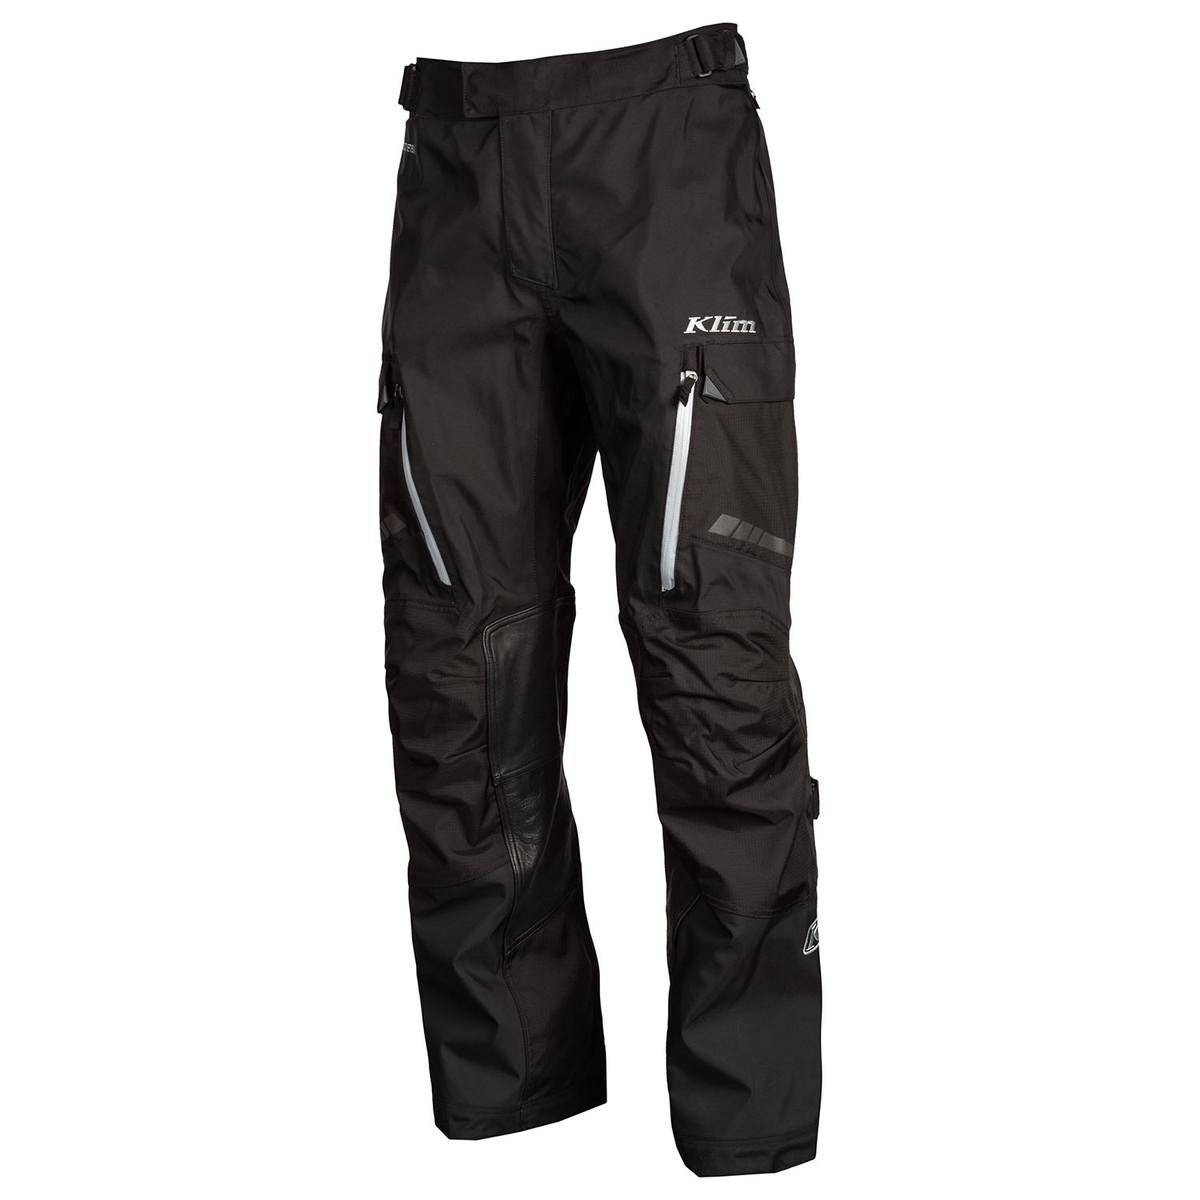 Klim Carlsbad Pantalon De Moto Stealth Noir 38